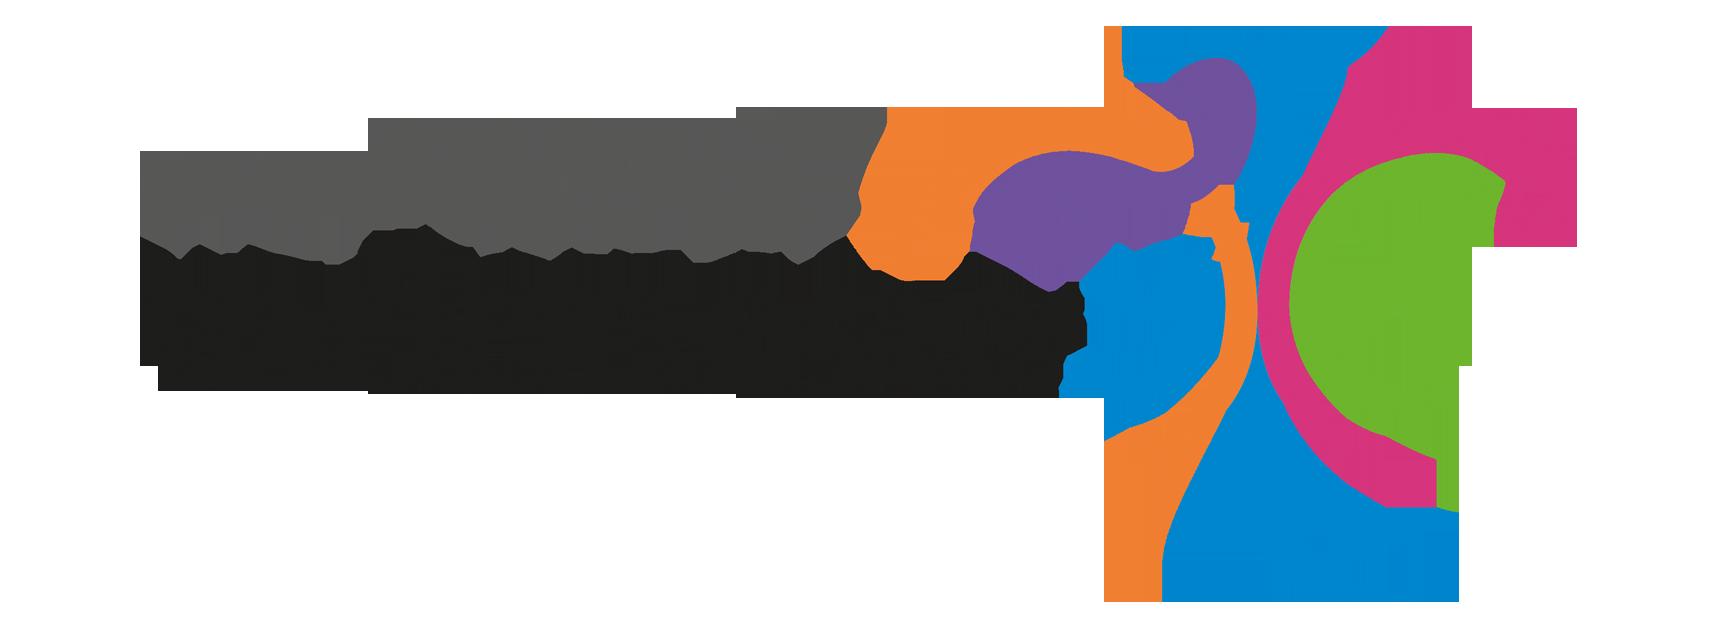 #DiIndonesiaAja